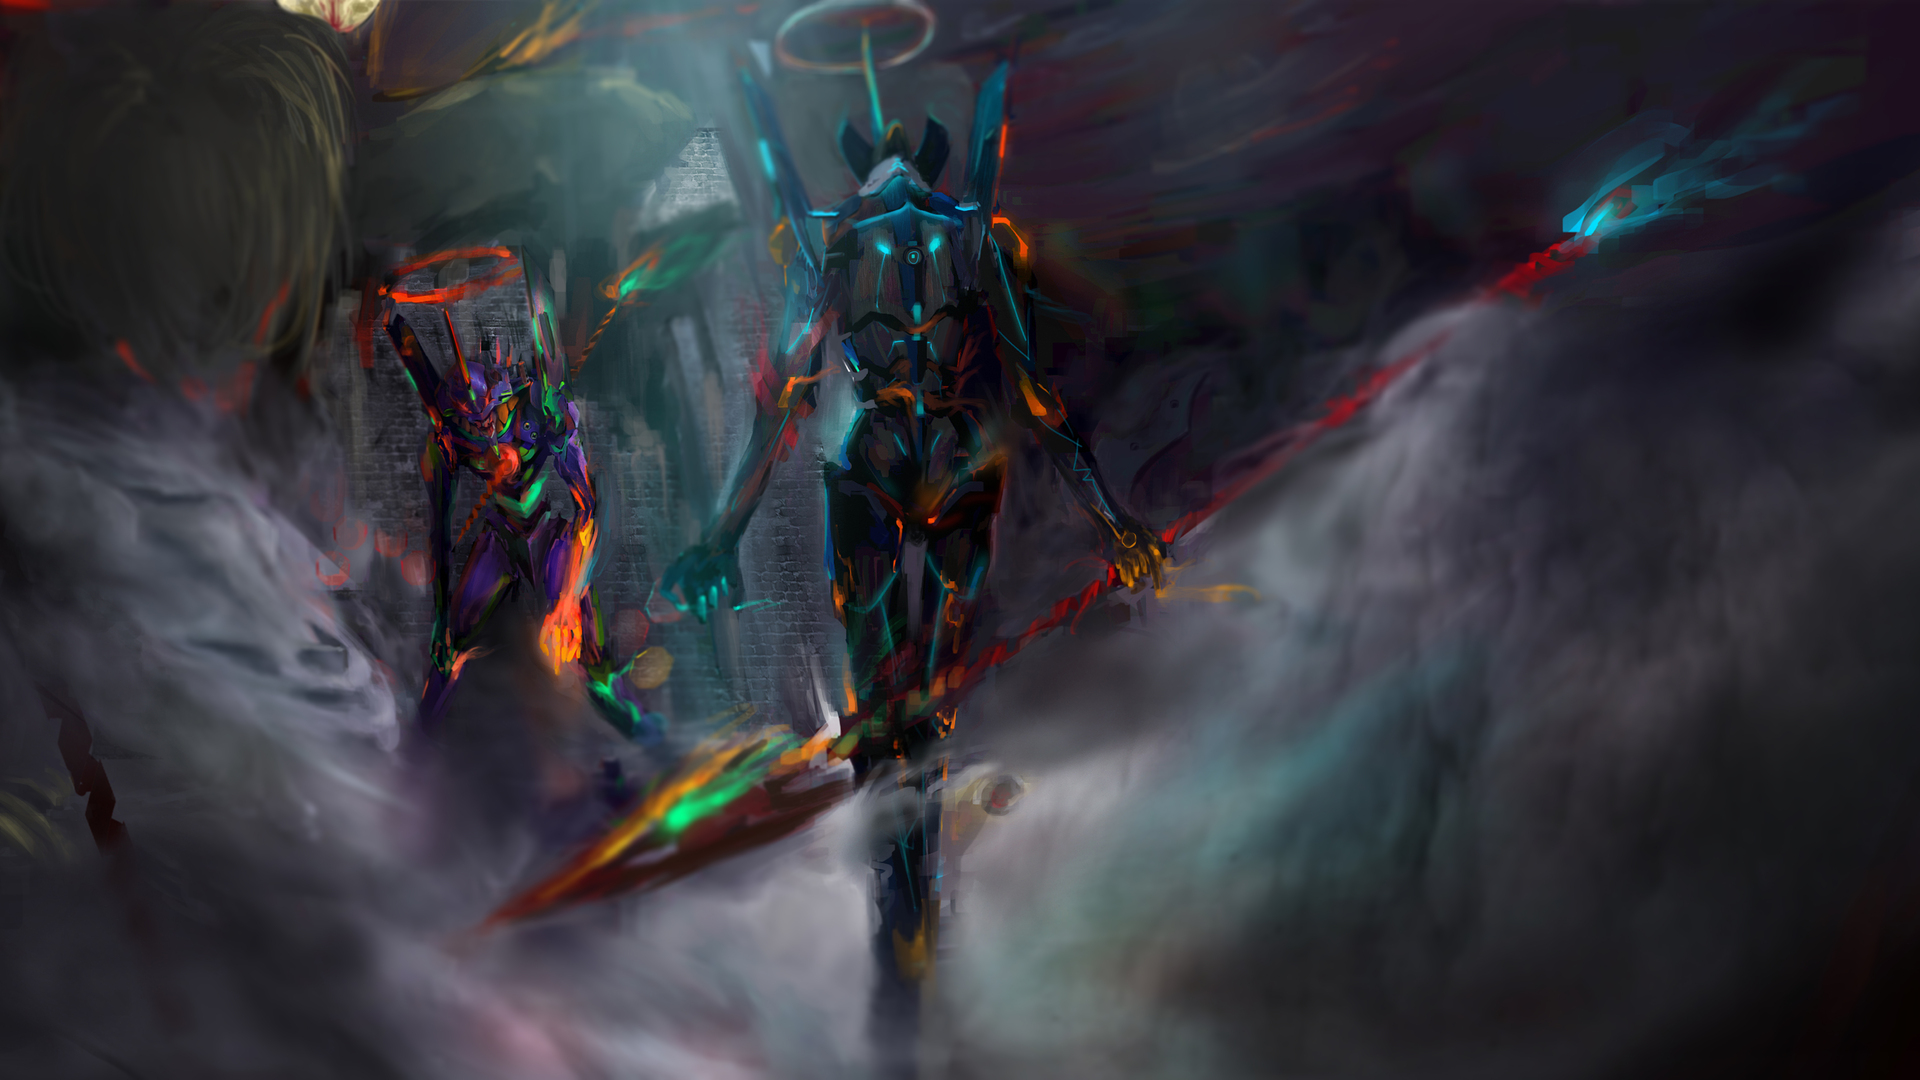 1920x1080 neon genesis evangelion 12k laptop full hd 1080p - Anime background wallpaper 4k ...